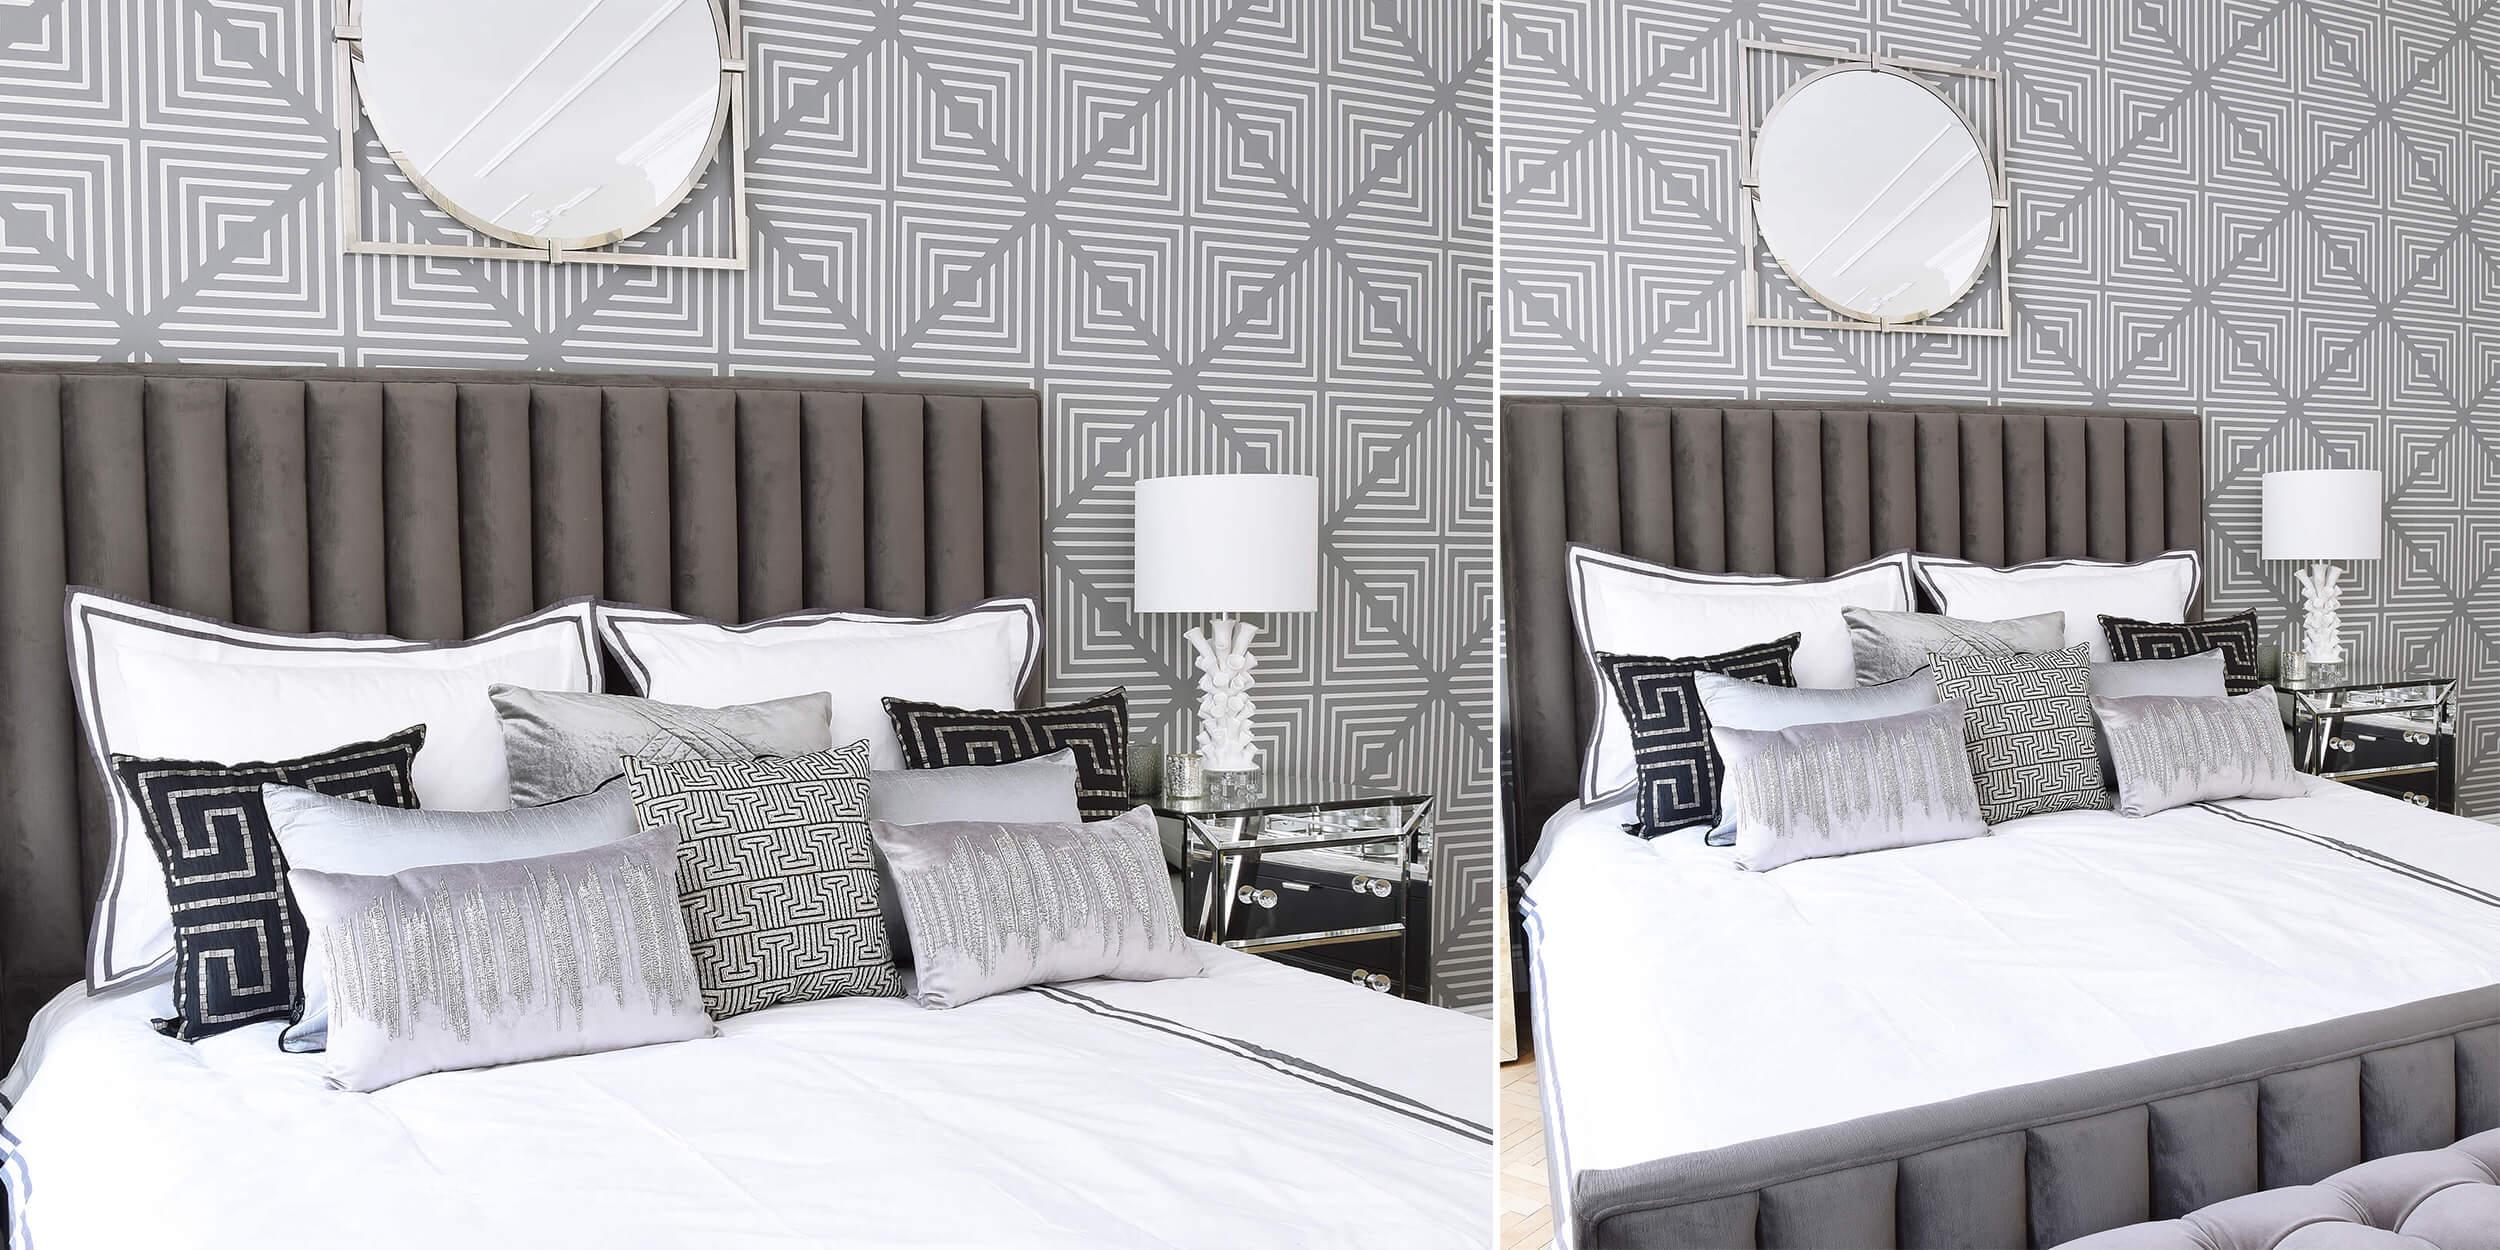 Elegant & Colourless Bedroomdecor